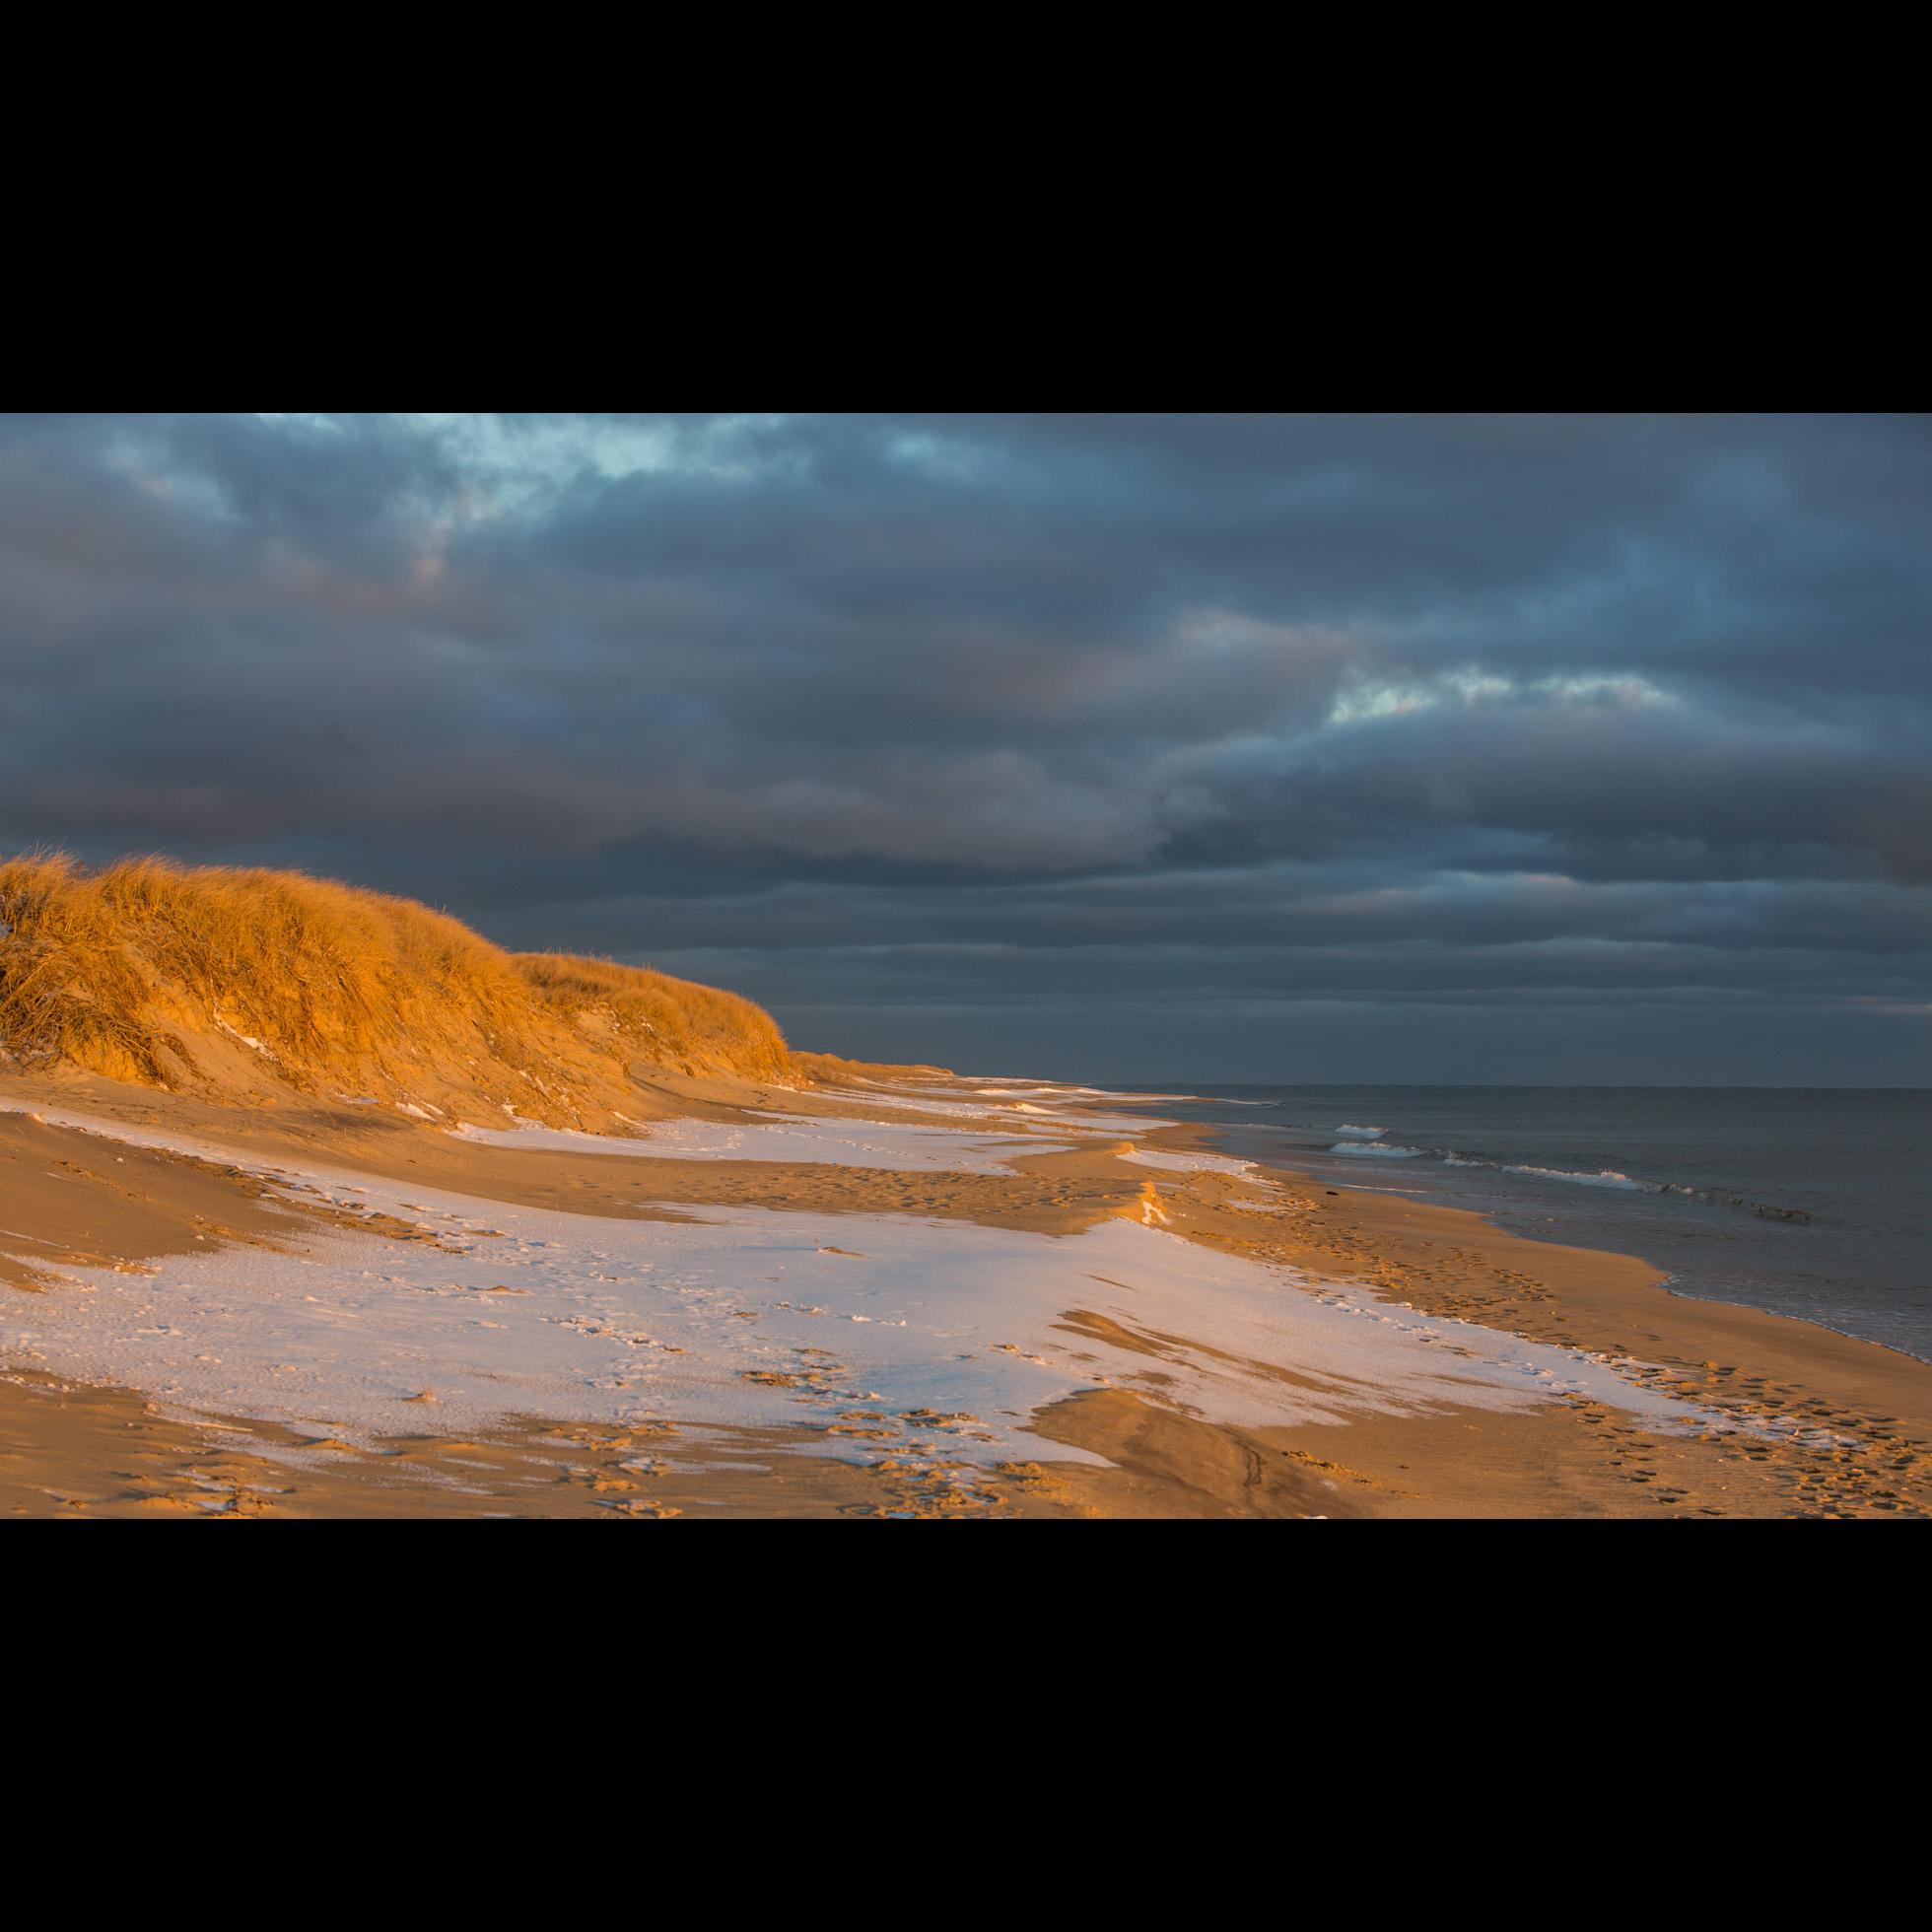 1.5 SOUTH BEACH SUNSET